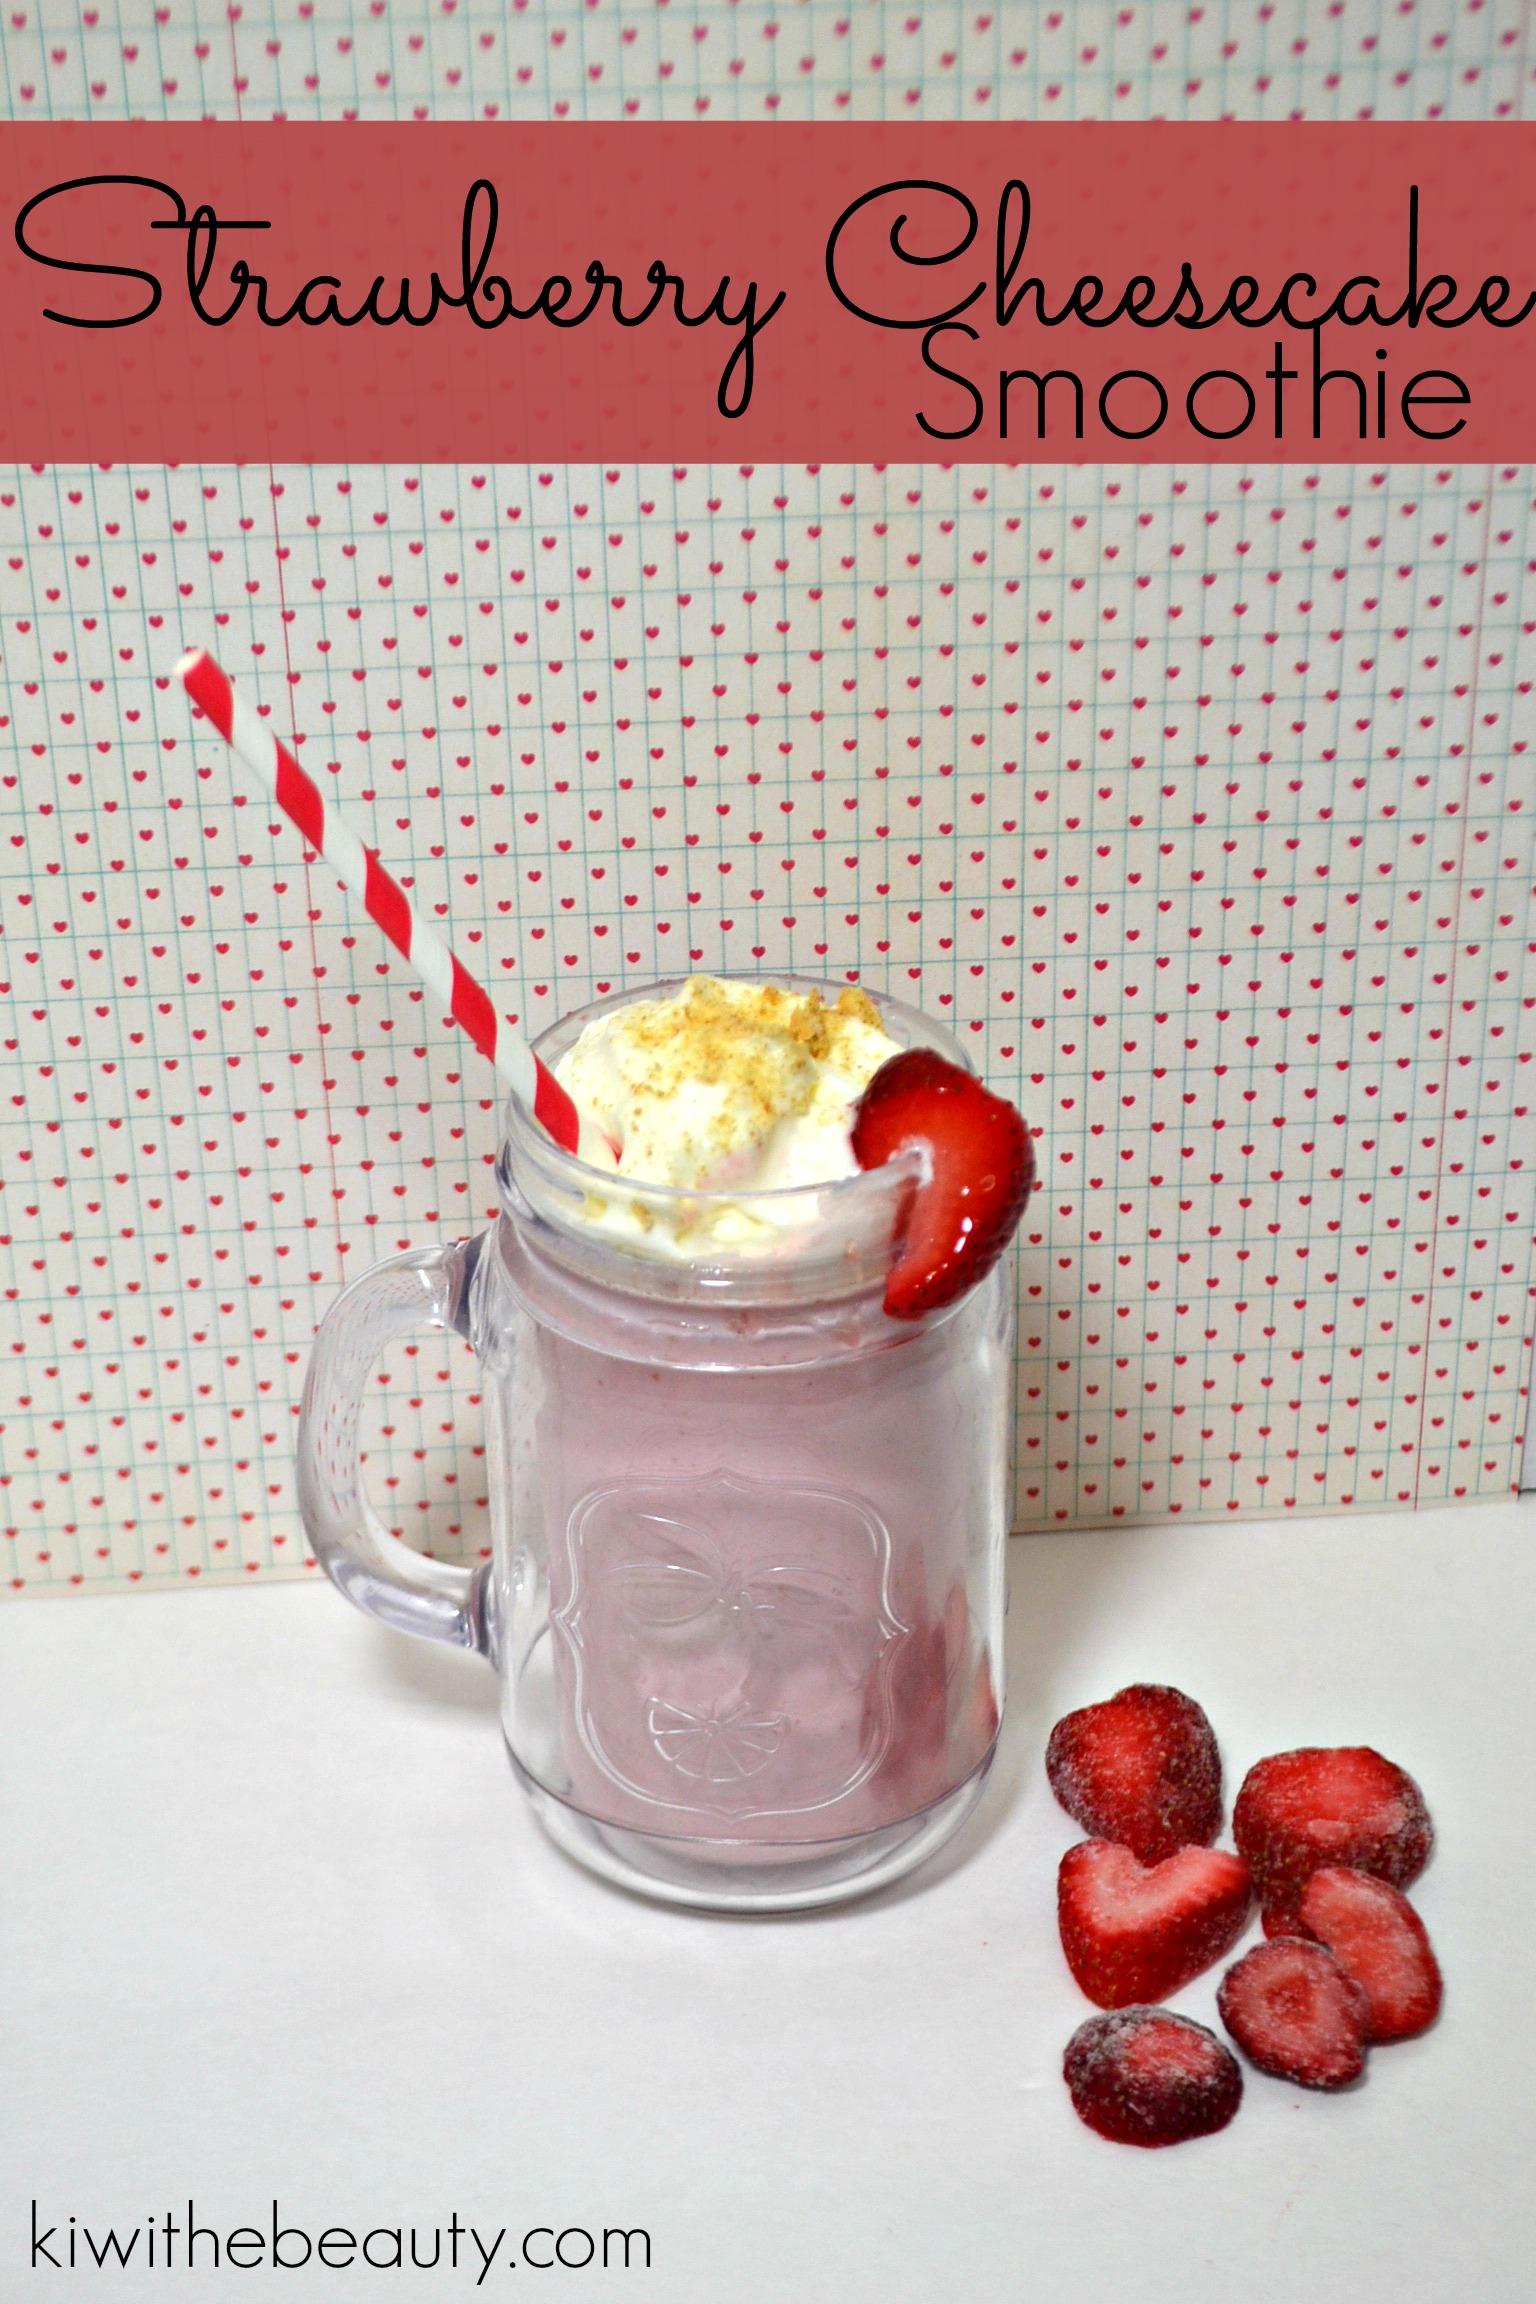 muller-me-moment-yogurt-smoothie